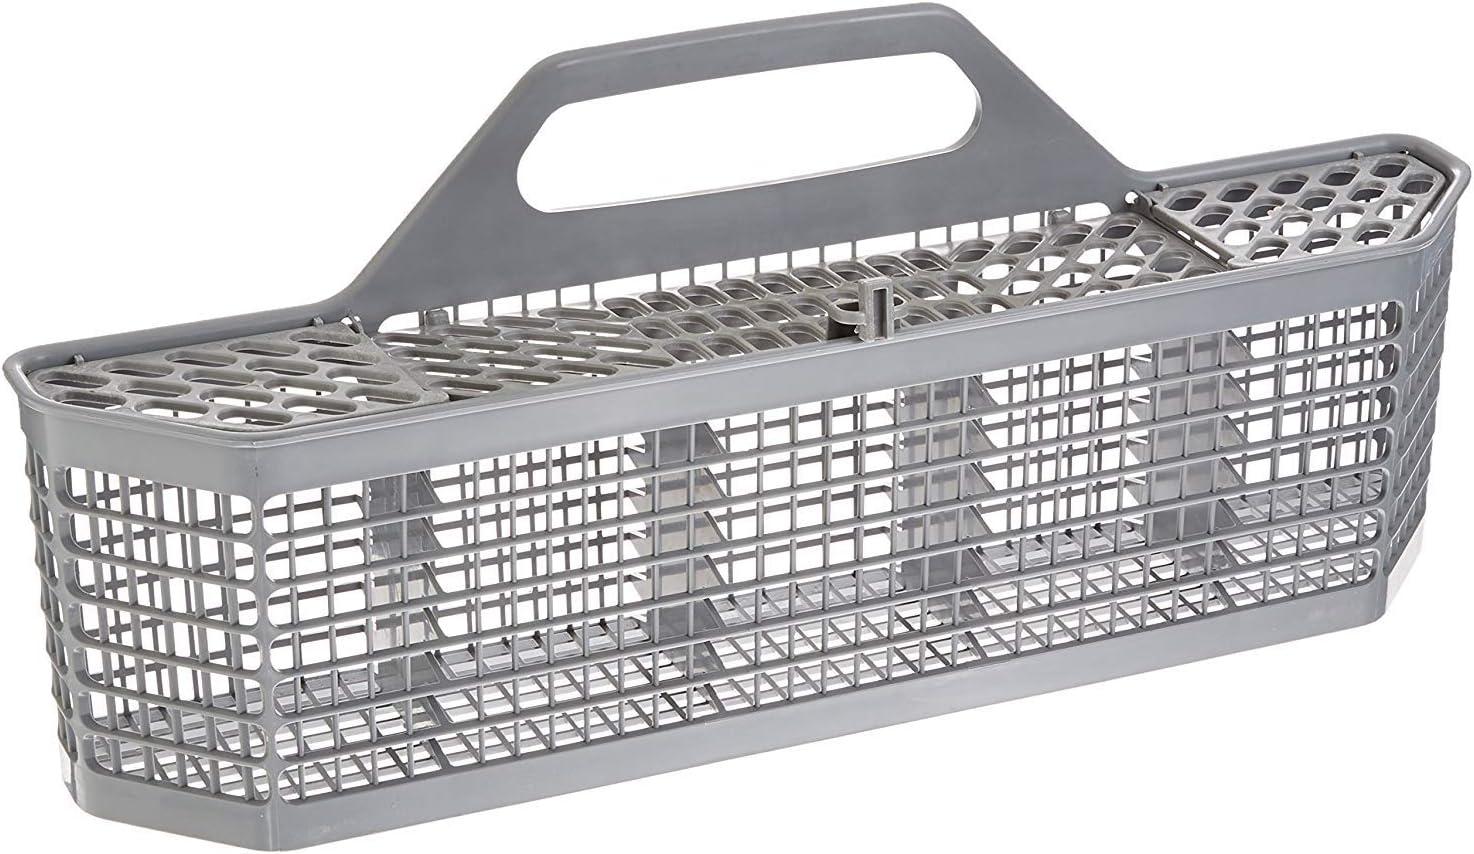 Lifetime Appliance WD28X10128 Silverware Basket for General Electric (GE) Dishwasher